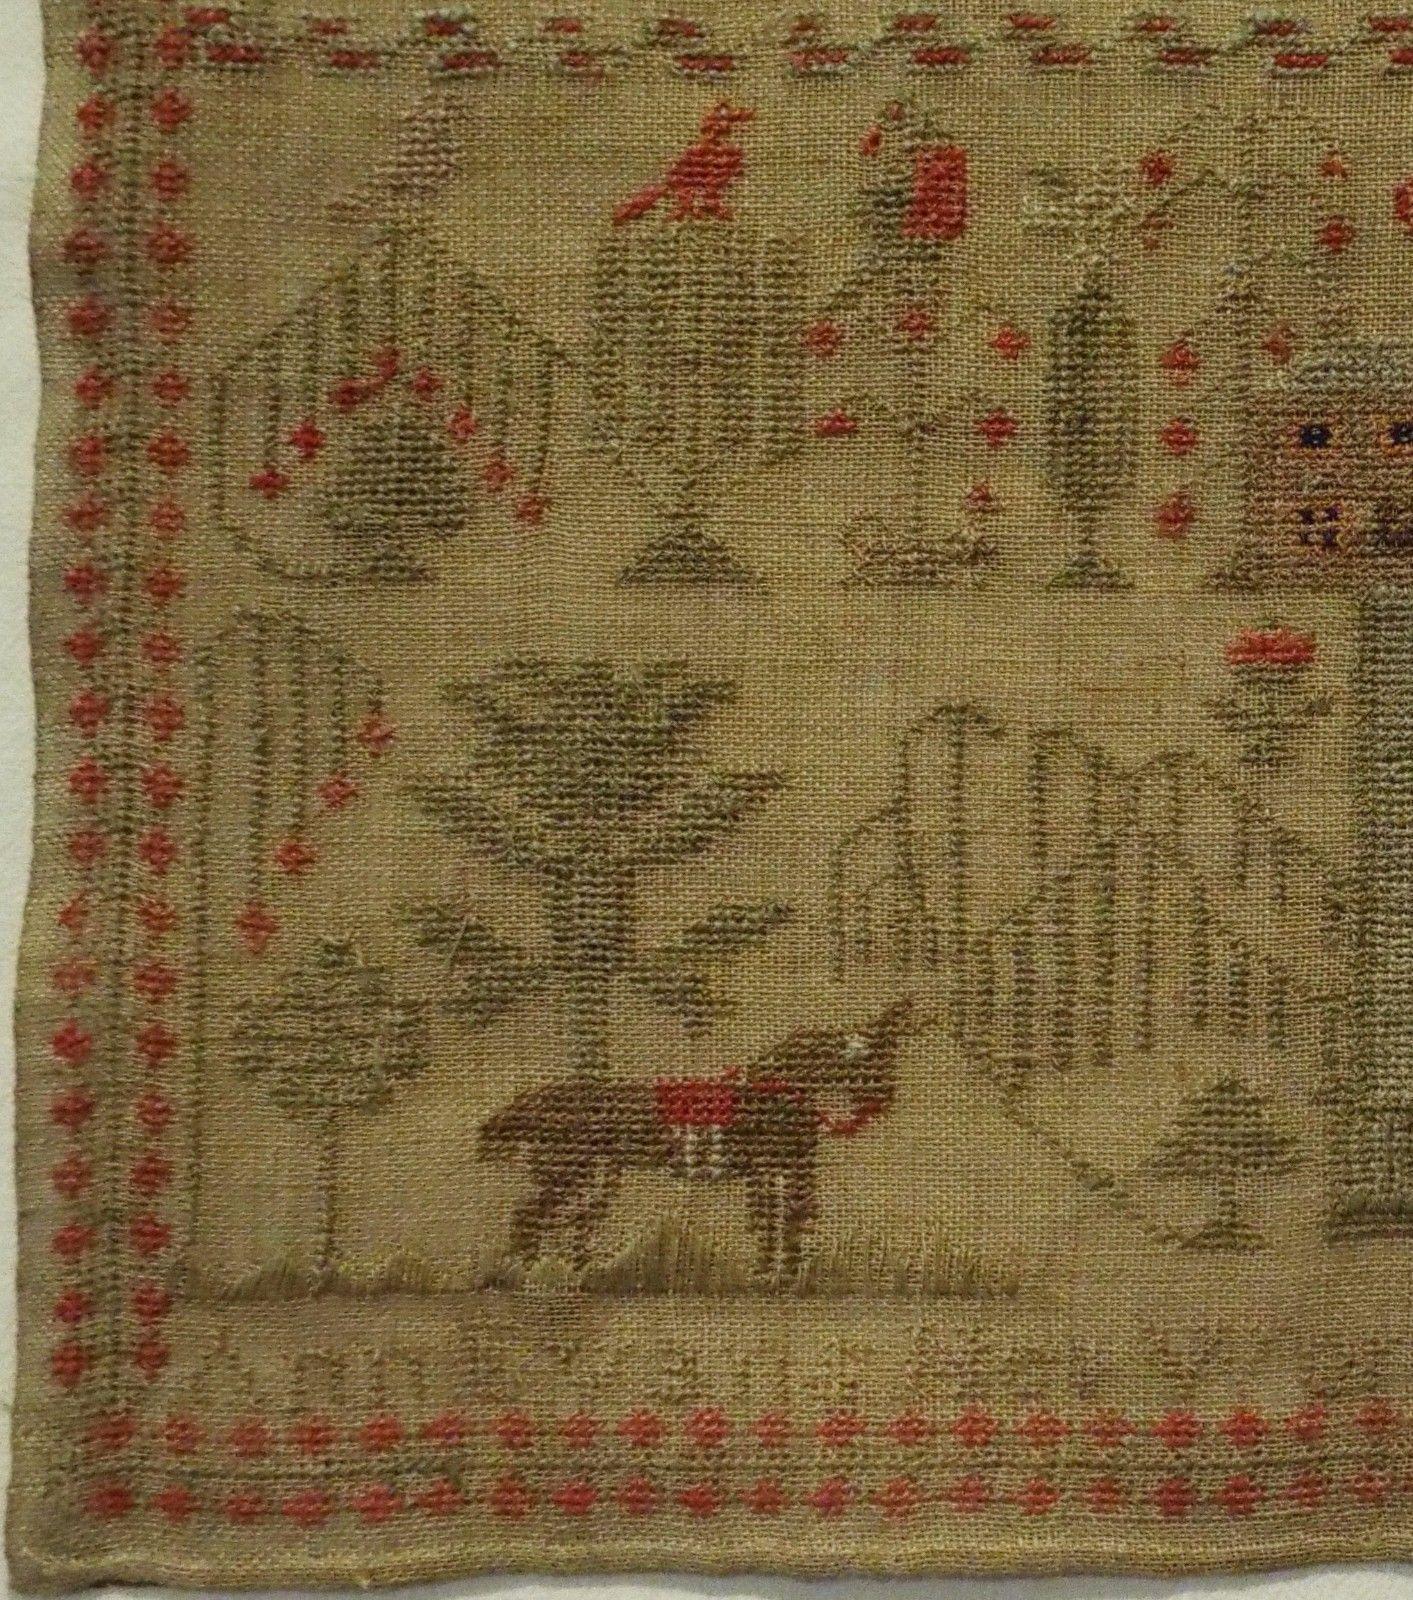 Early/mid 19th century house, horse & hymn sampler by ann evans aged ...